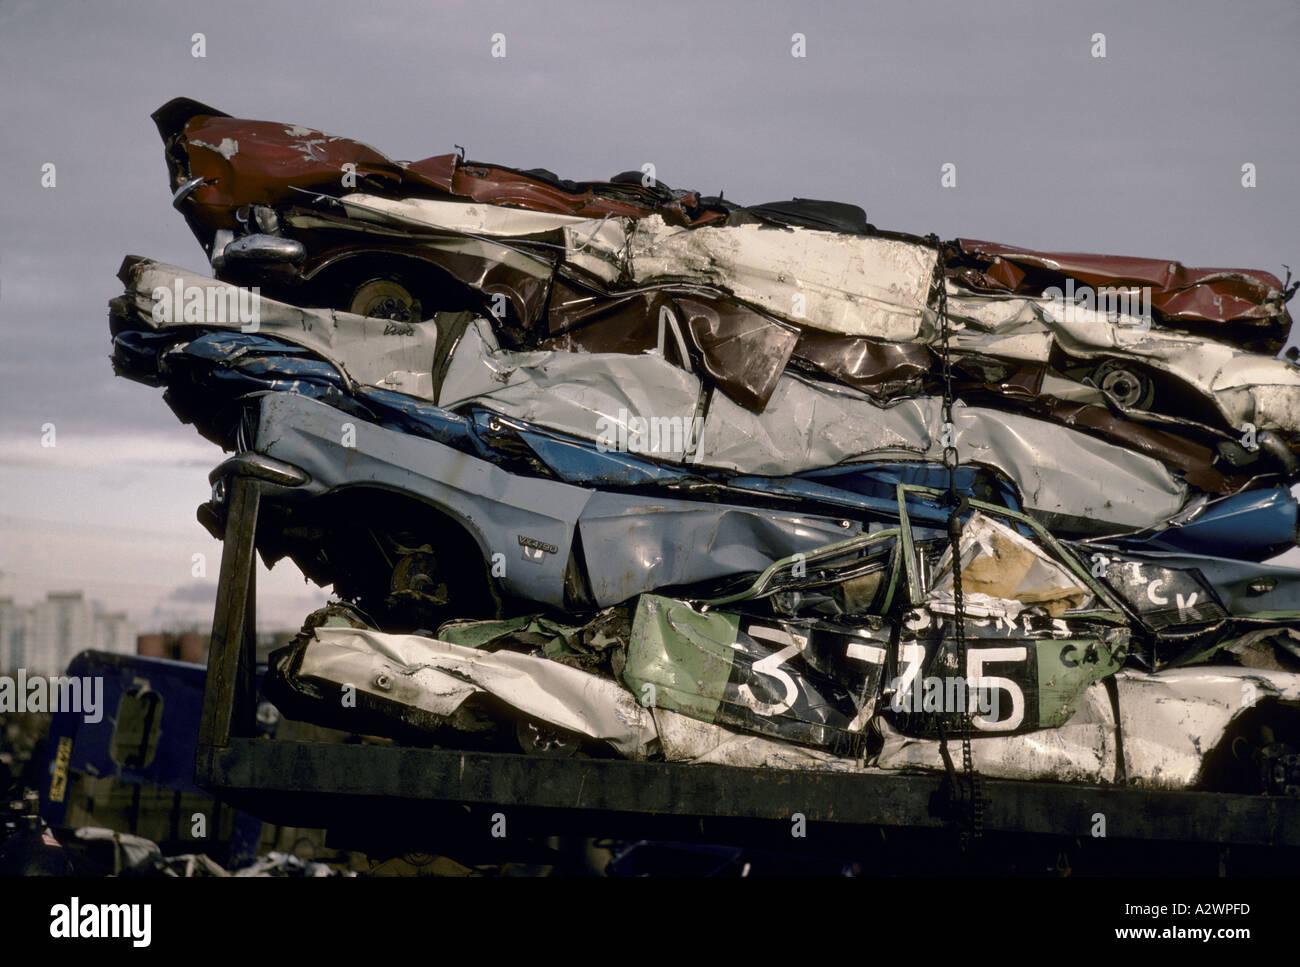 cars at scrapyards Stock Photo, Royalty Free Image: 3461884 - Alamy